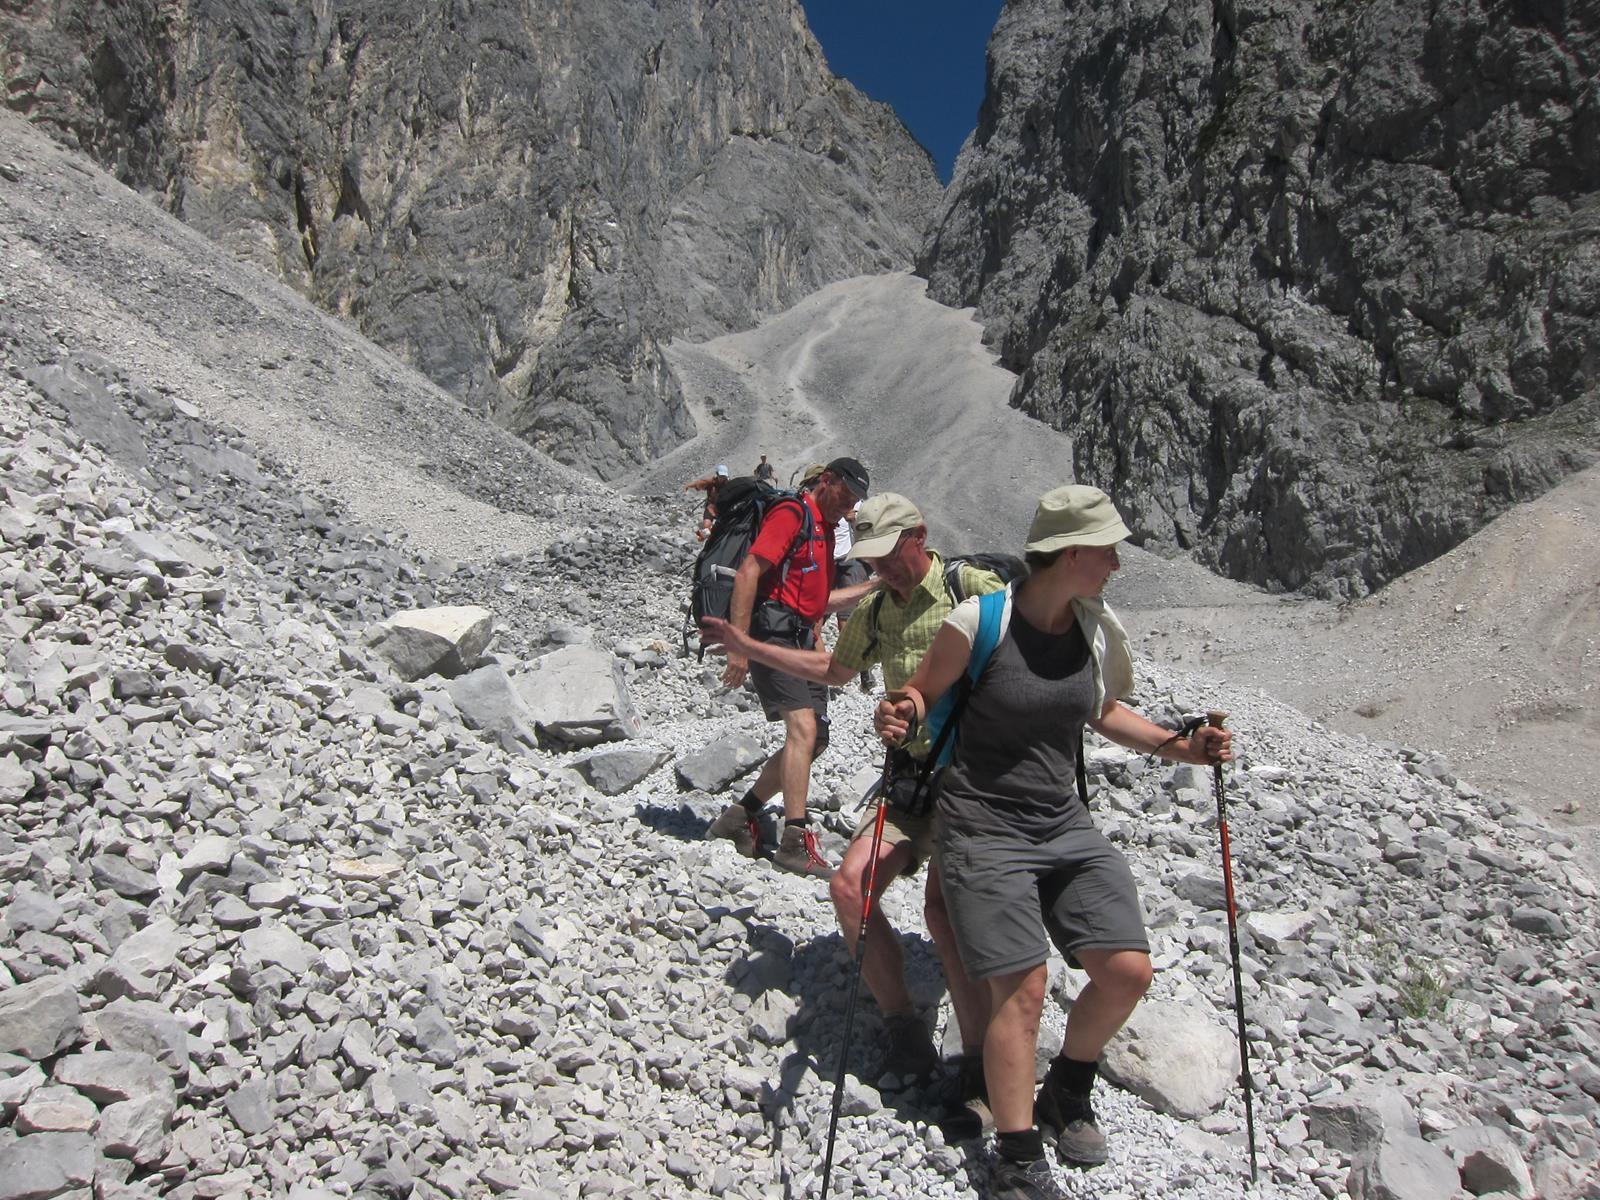 Duitsland - Te voet over de Alpen, etappe 1